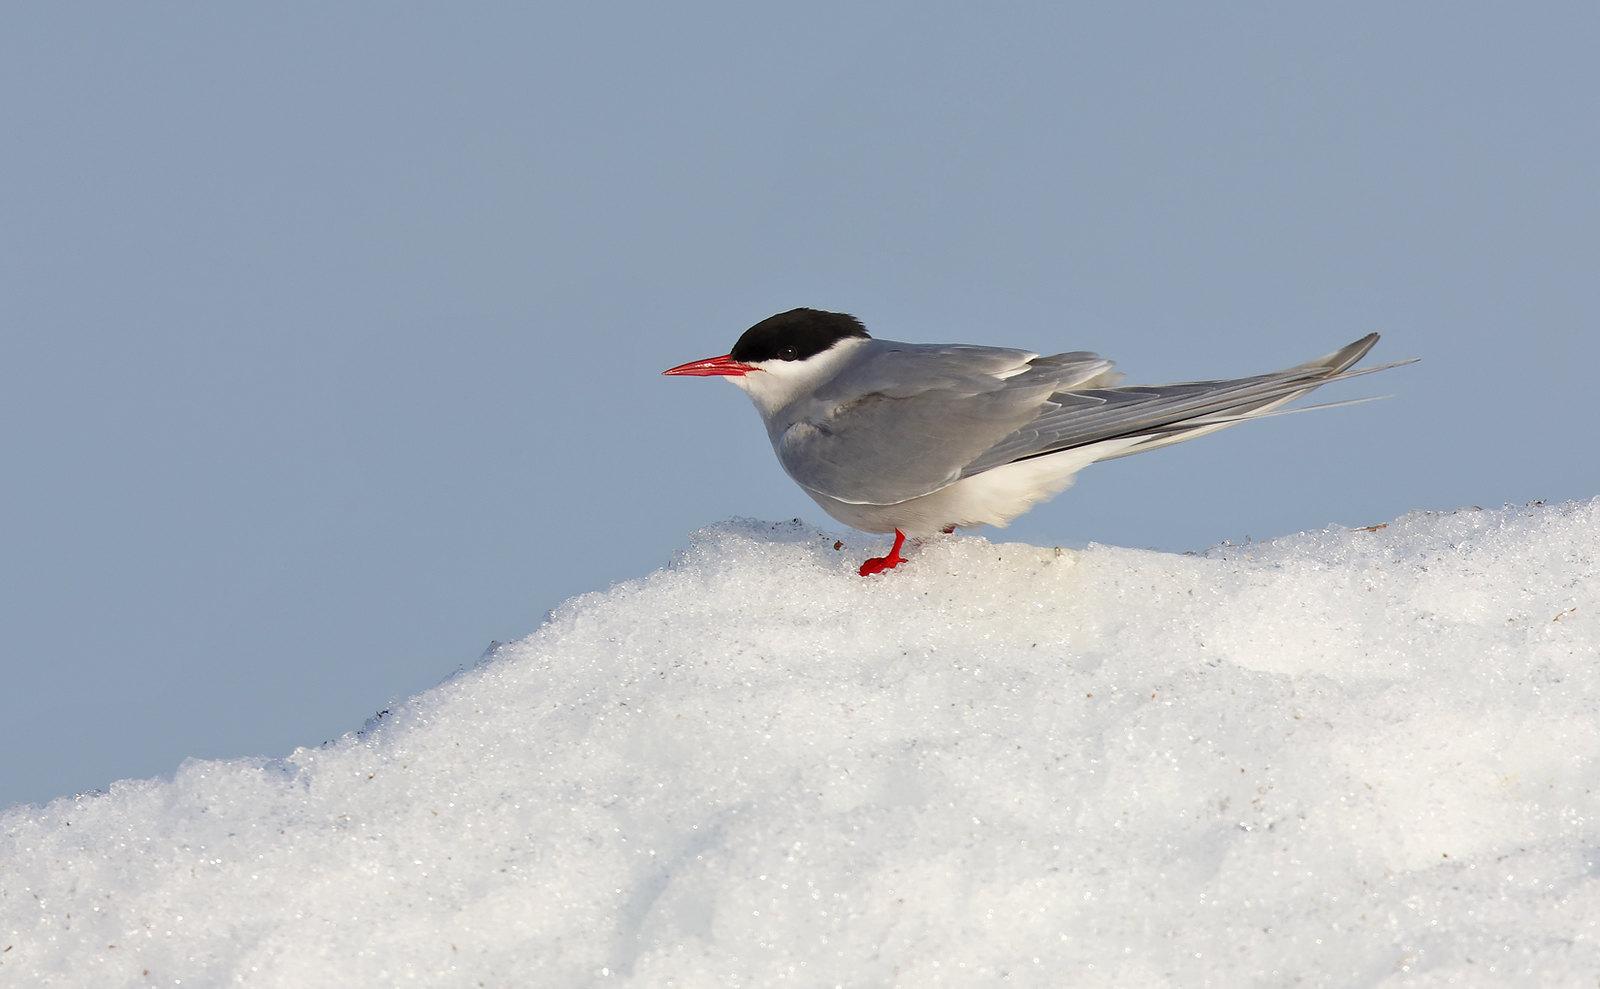 Arctic Tern on snow